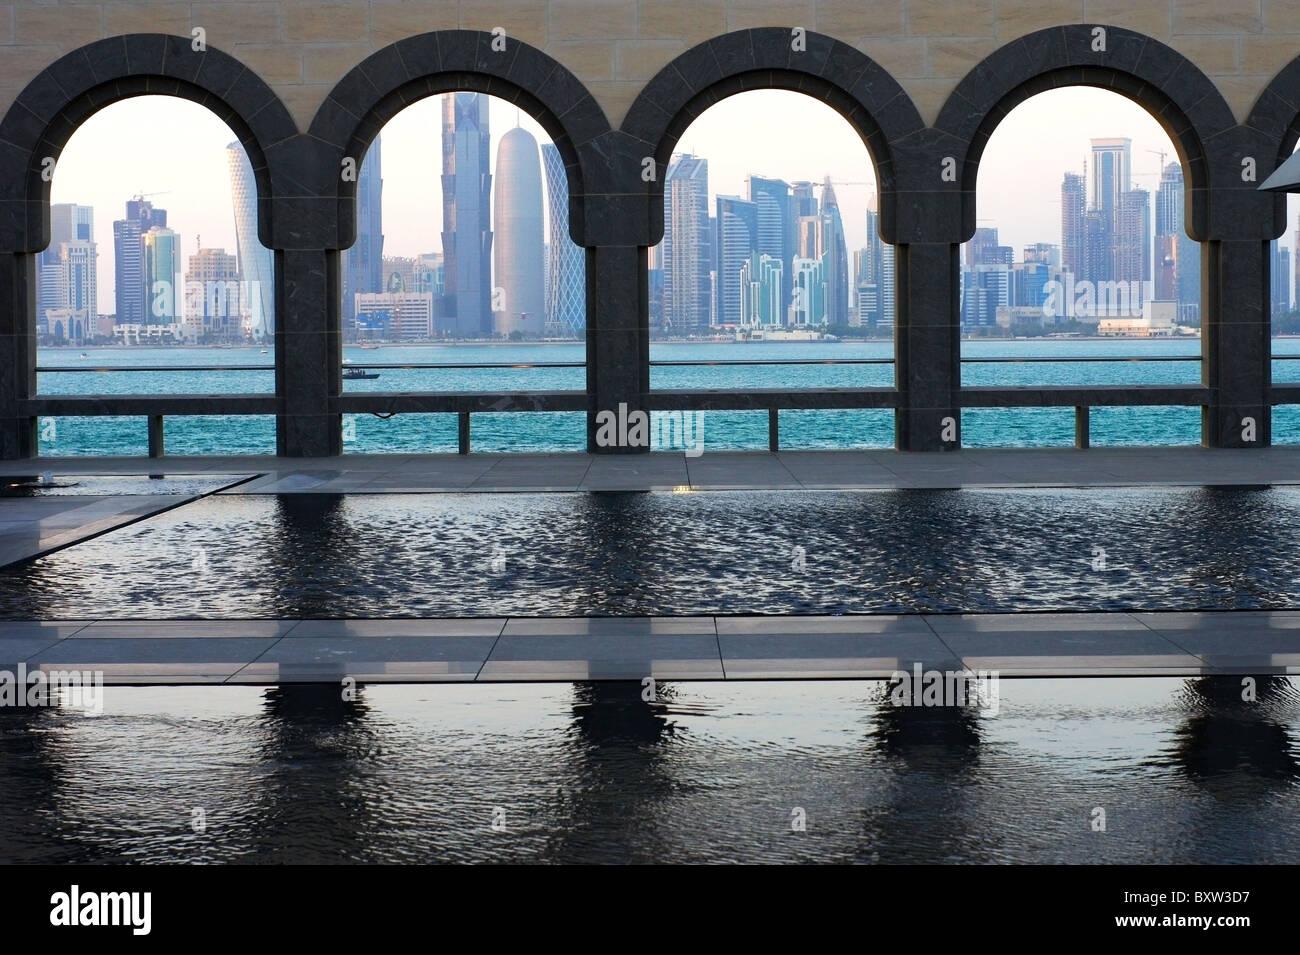 Skyline de Doha Museo de Arte Islámico de Qatar Imagen De Stock